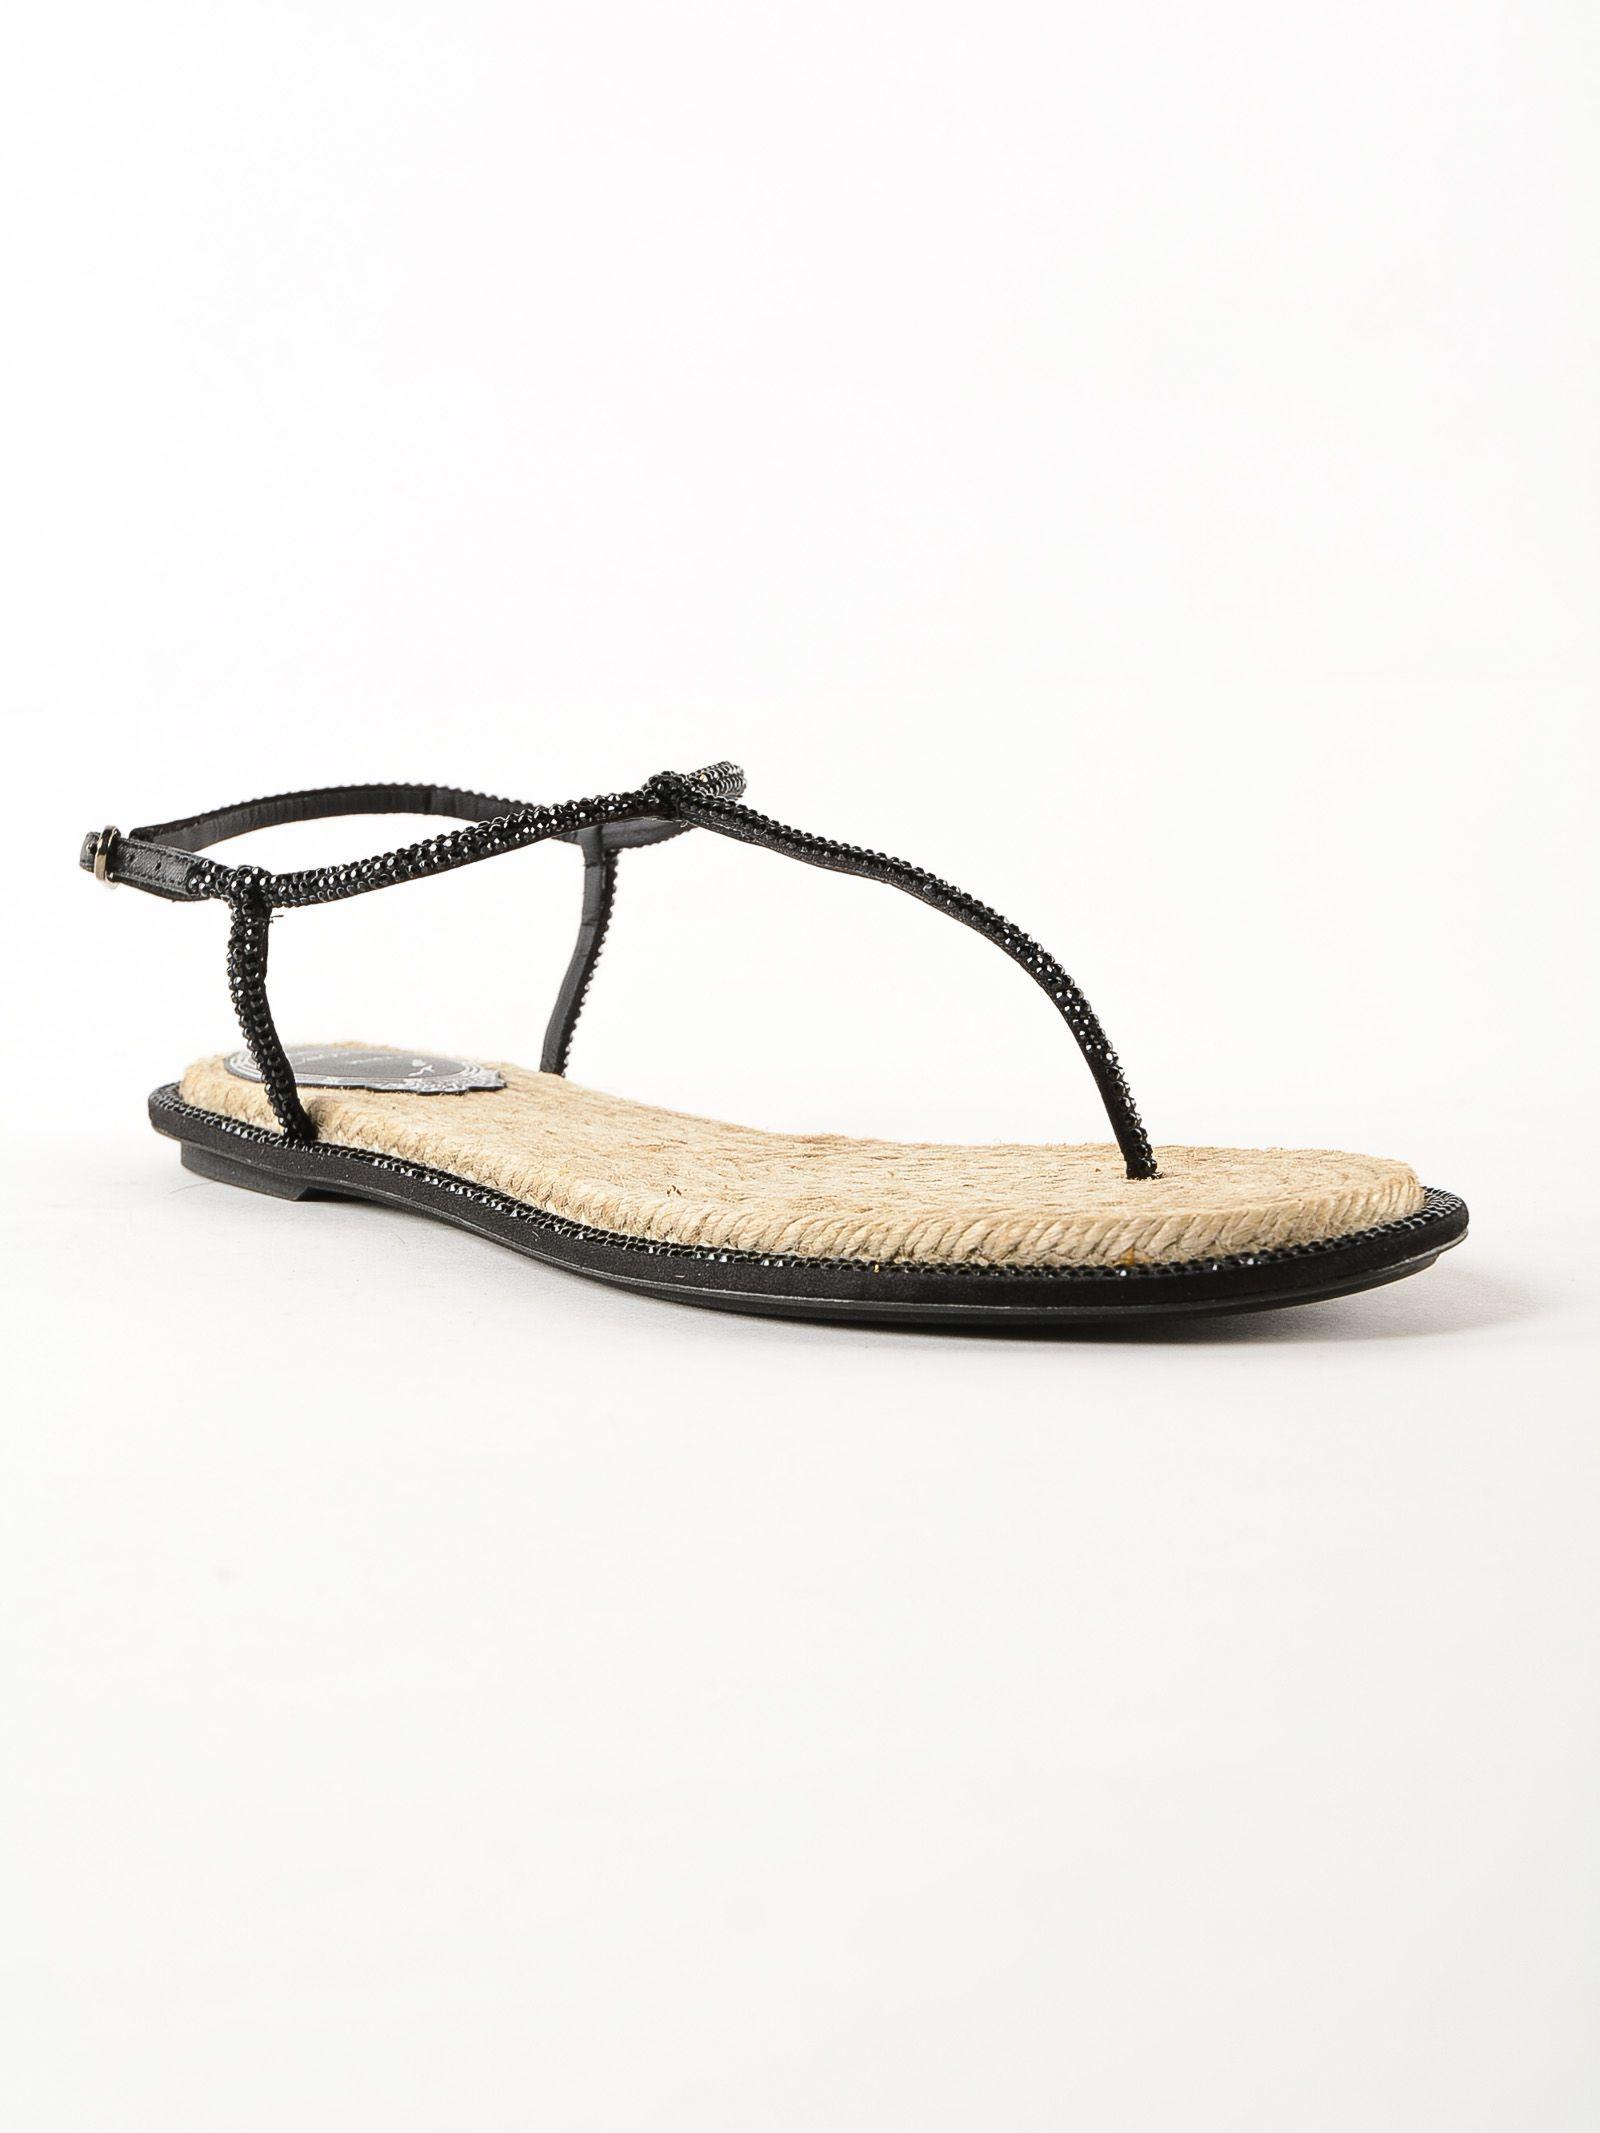 ... René Caovilla Rene Caovilla Thong Rope Jet Strass Flat Sandals - Black  ...